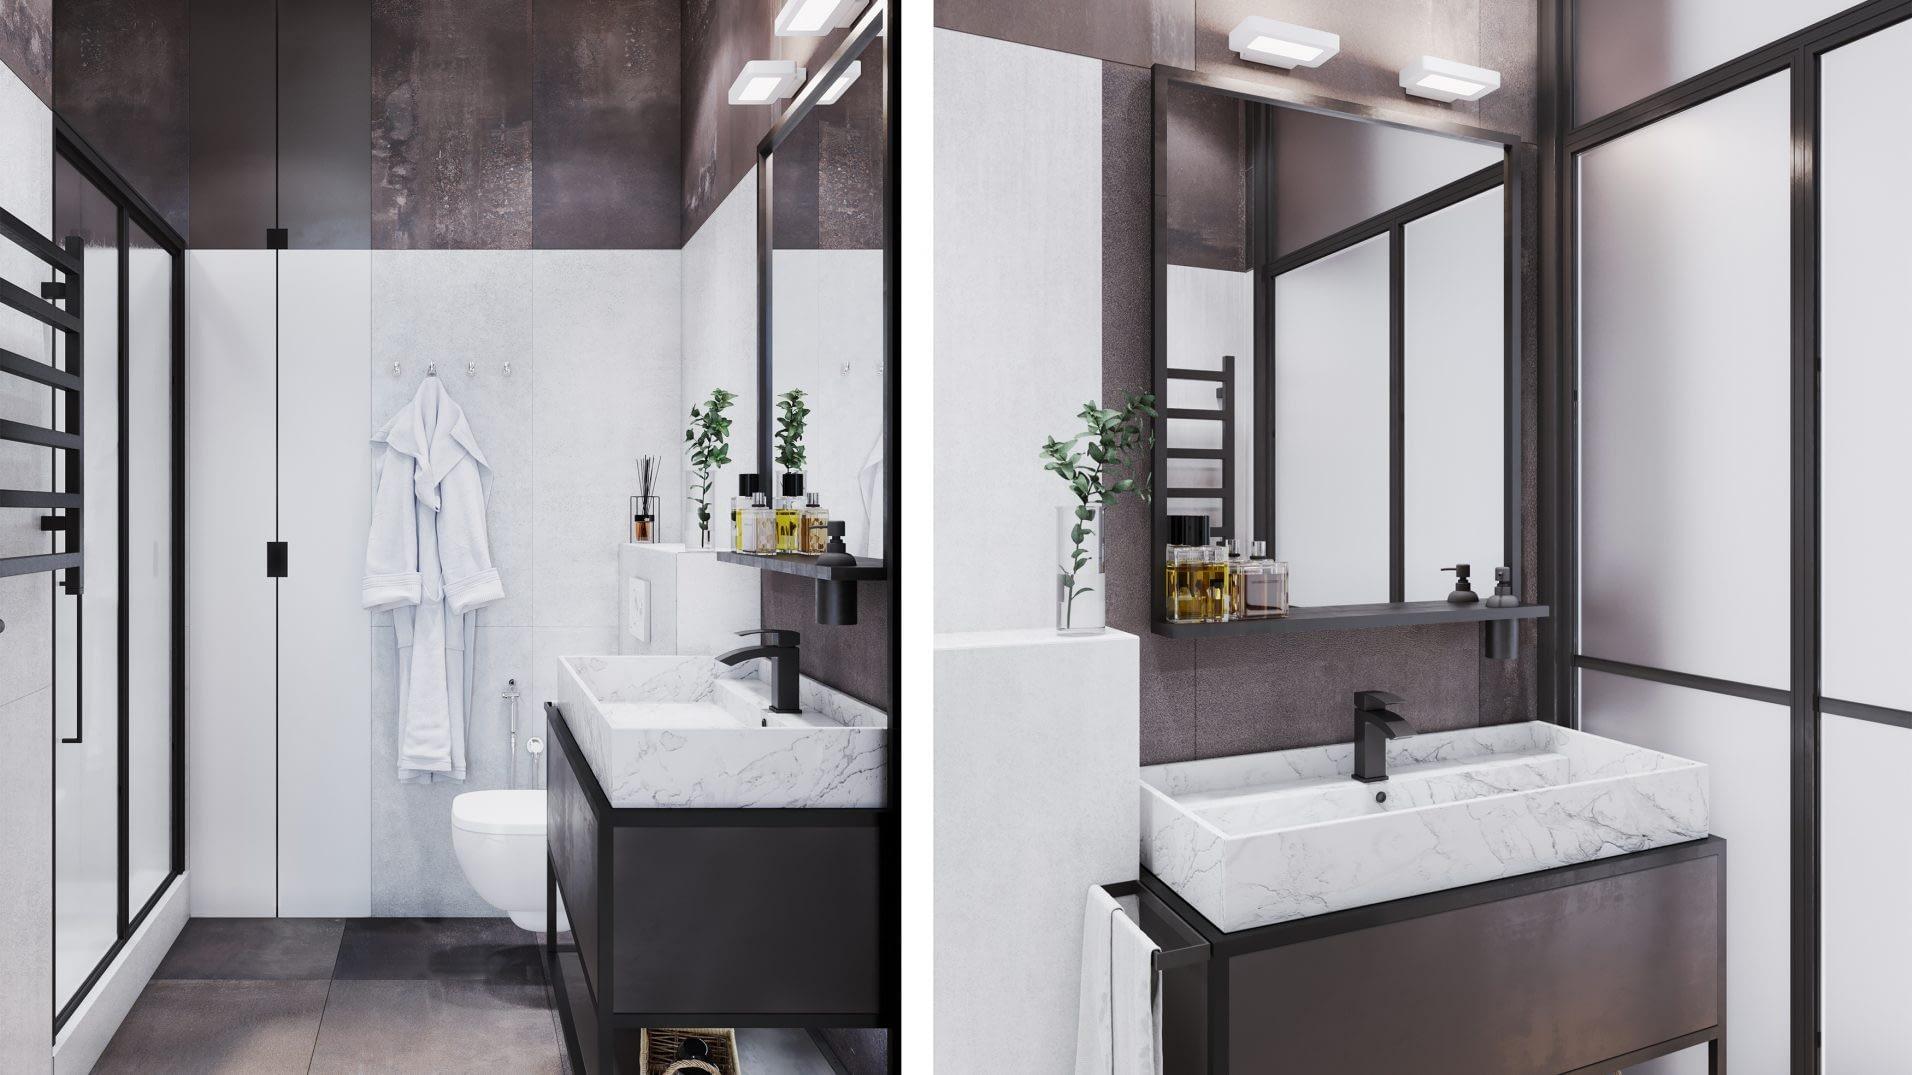 дизайн проект квартиры в ЖК Централ Парк от Lavrov Design